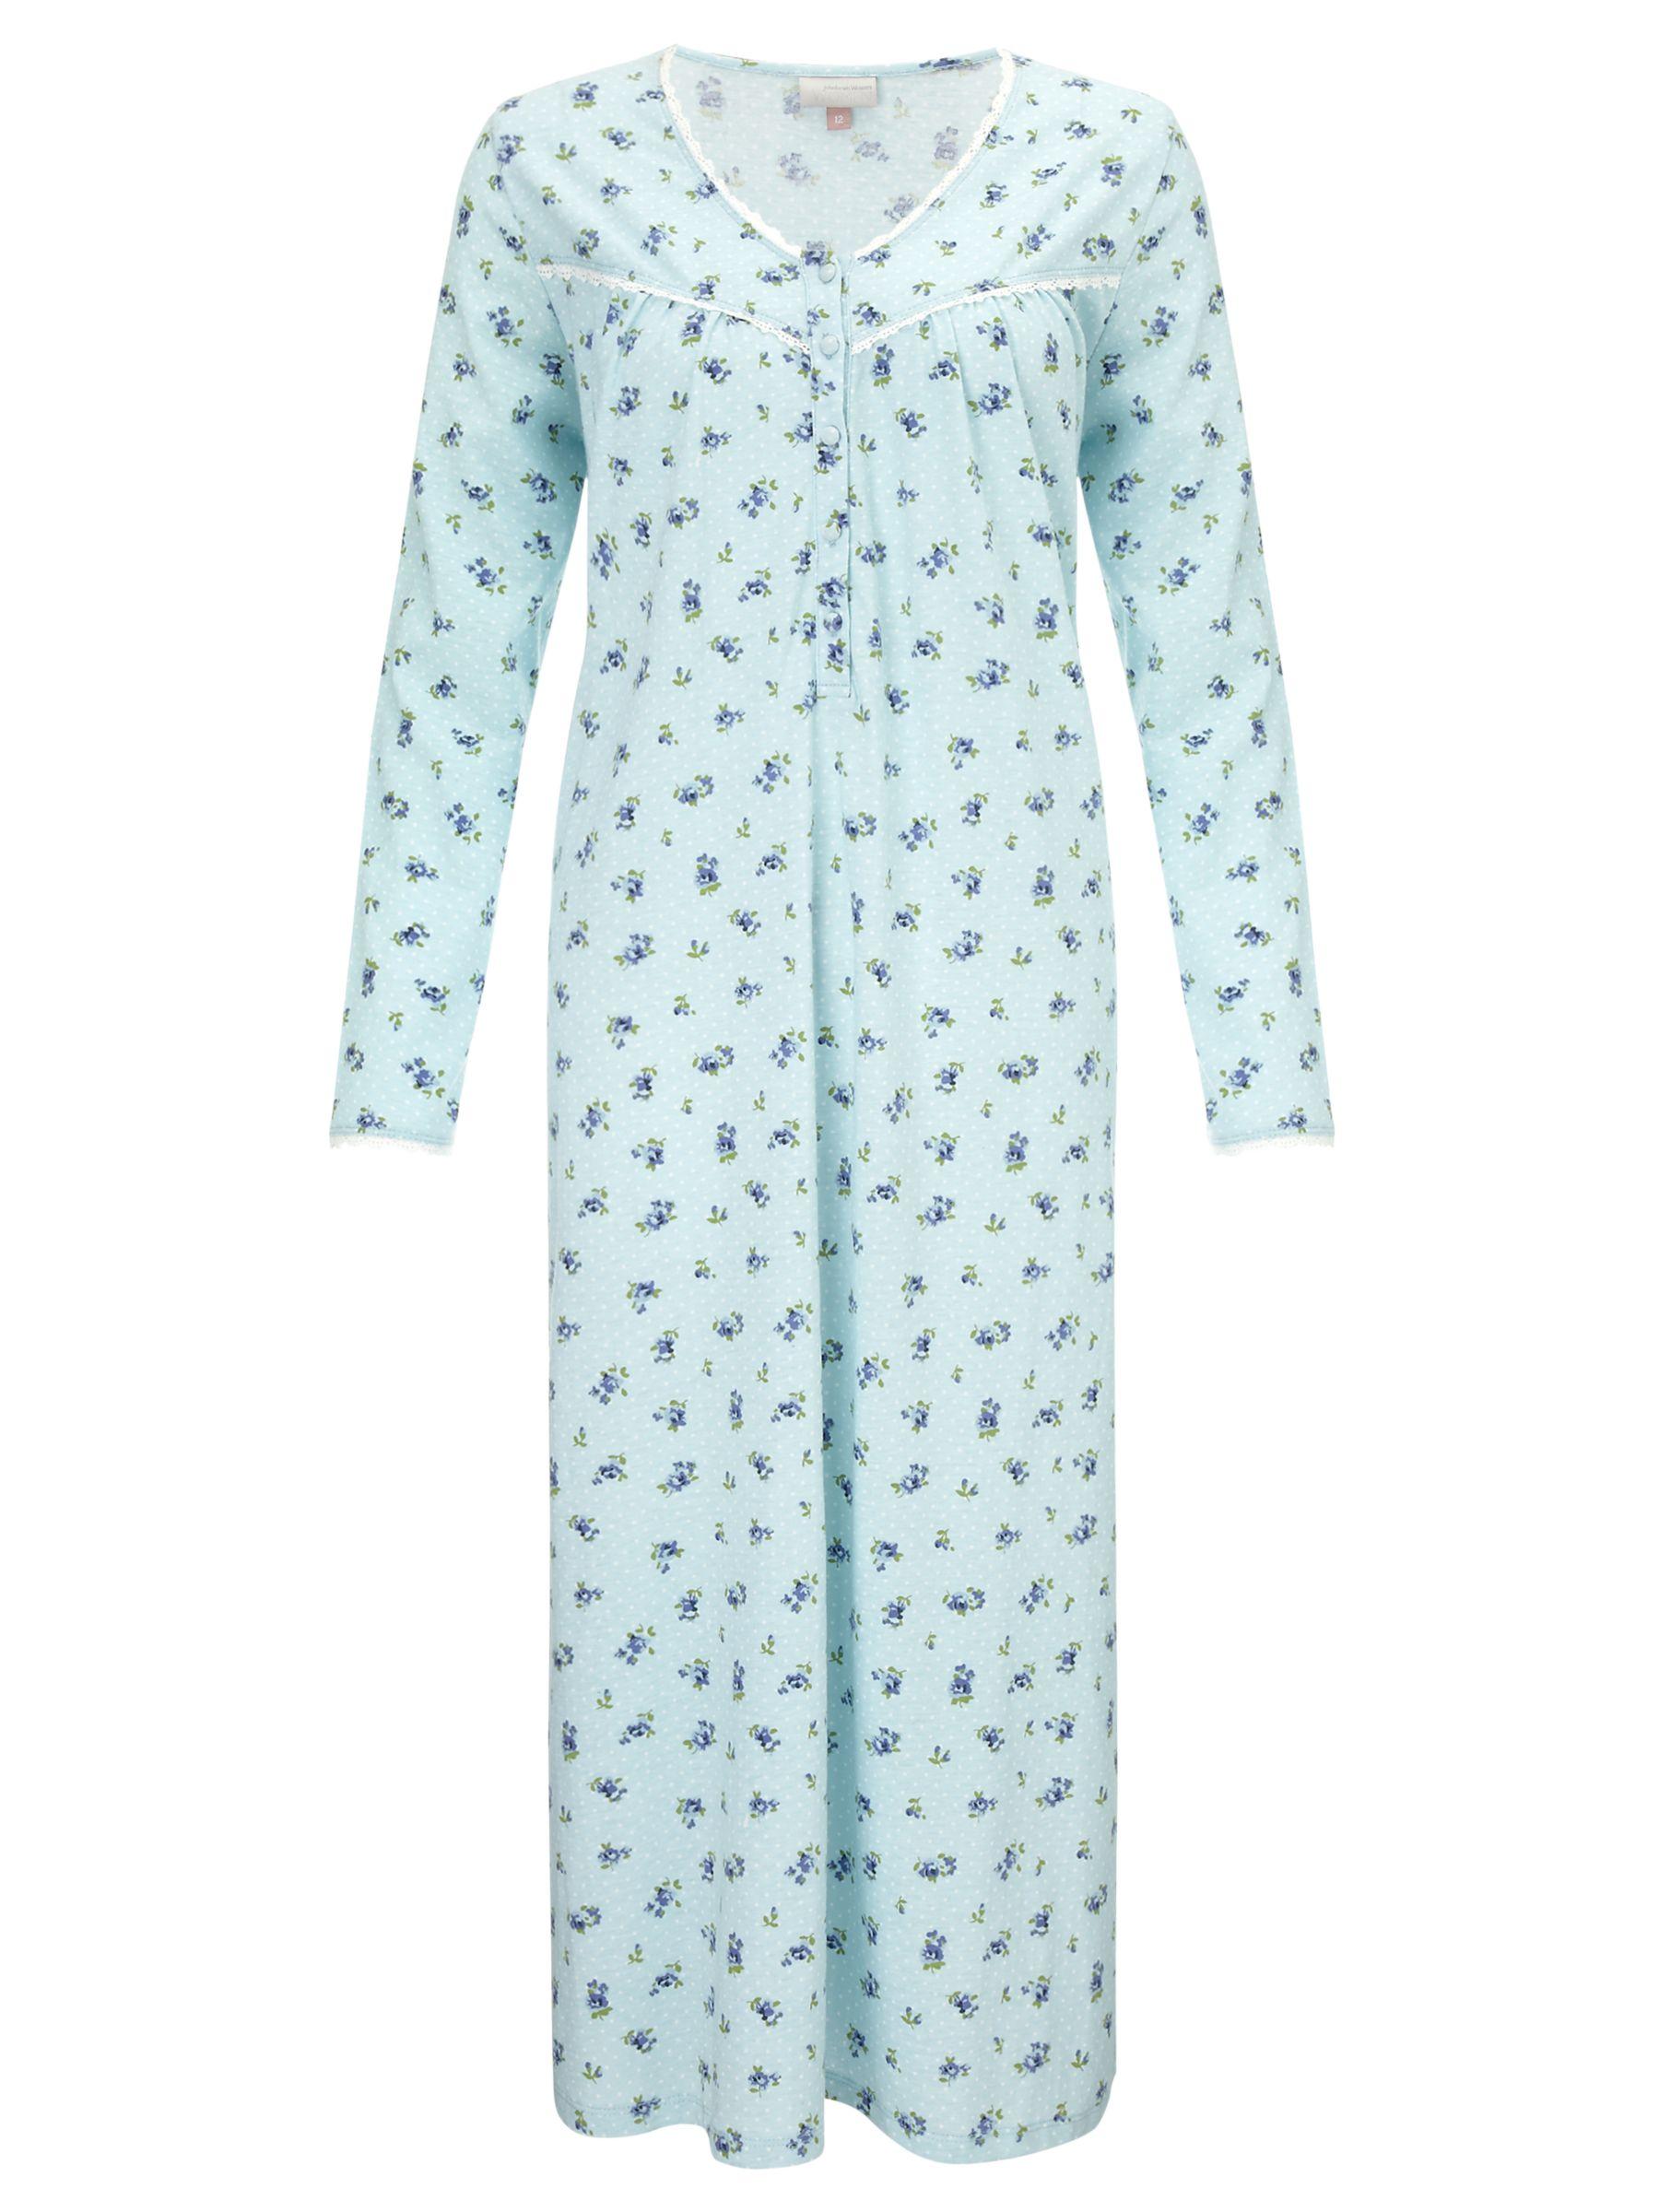 John Lewis Bunty Floral Nightdress, Duck Egg